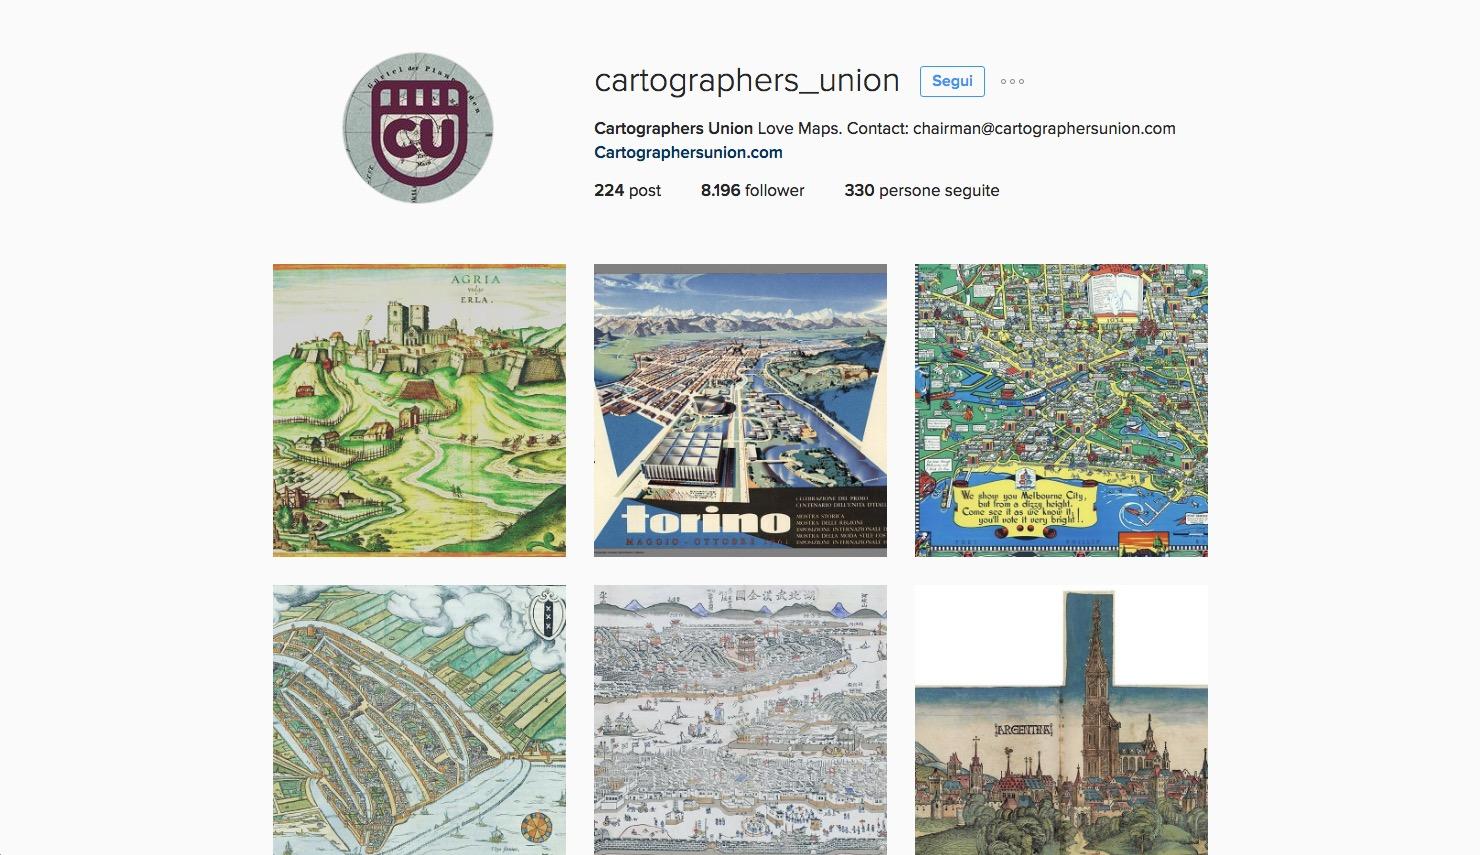 cartographers_union